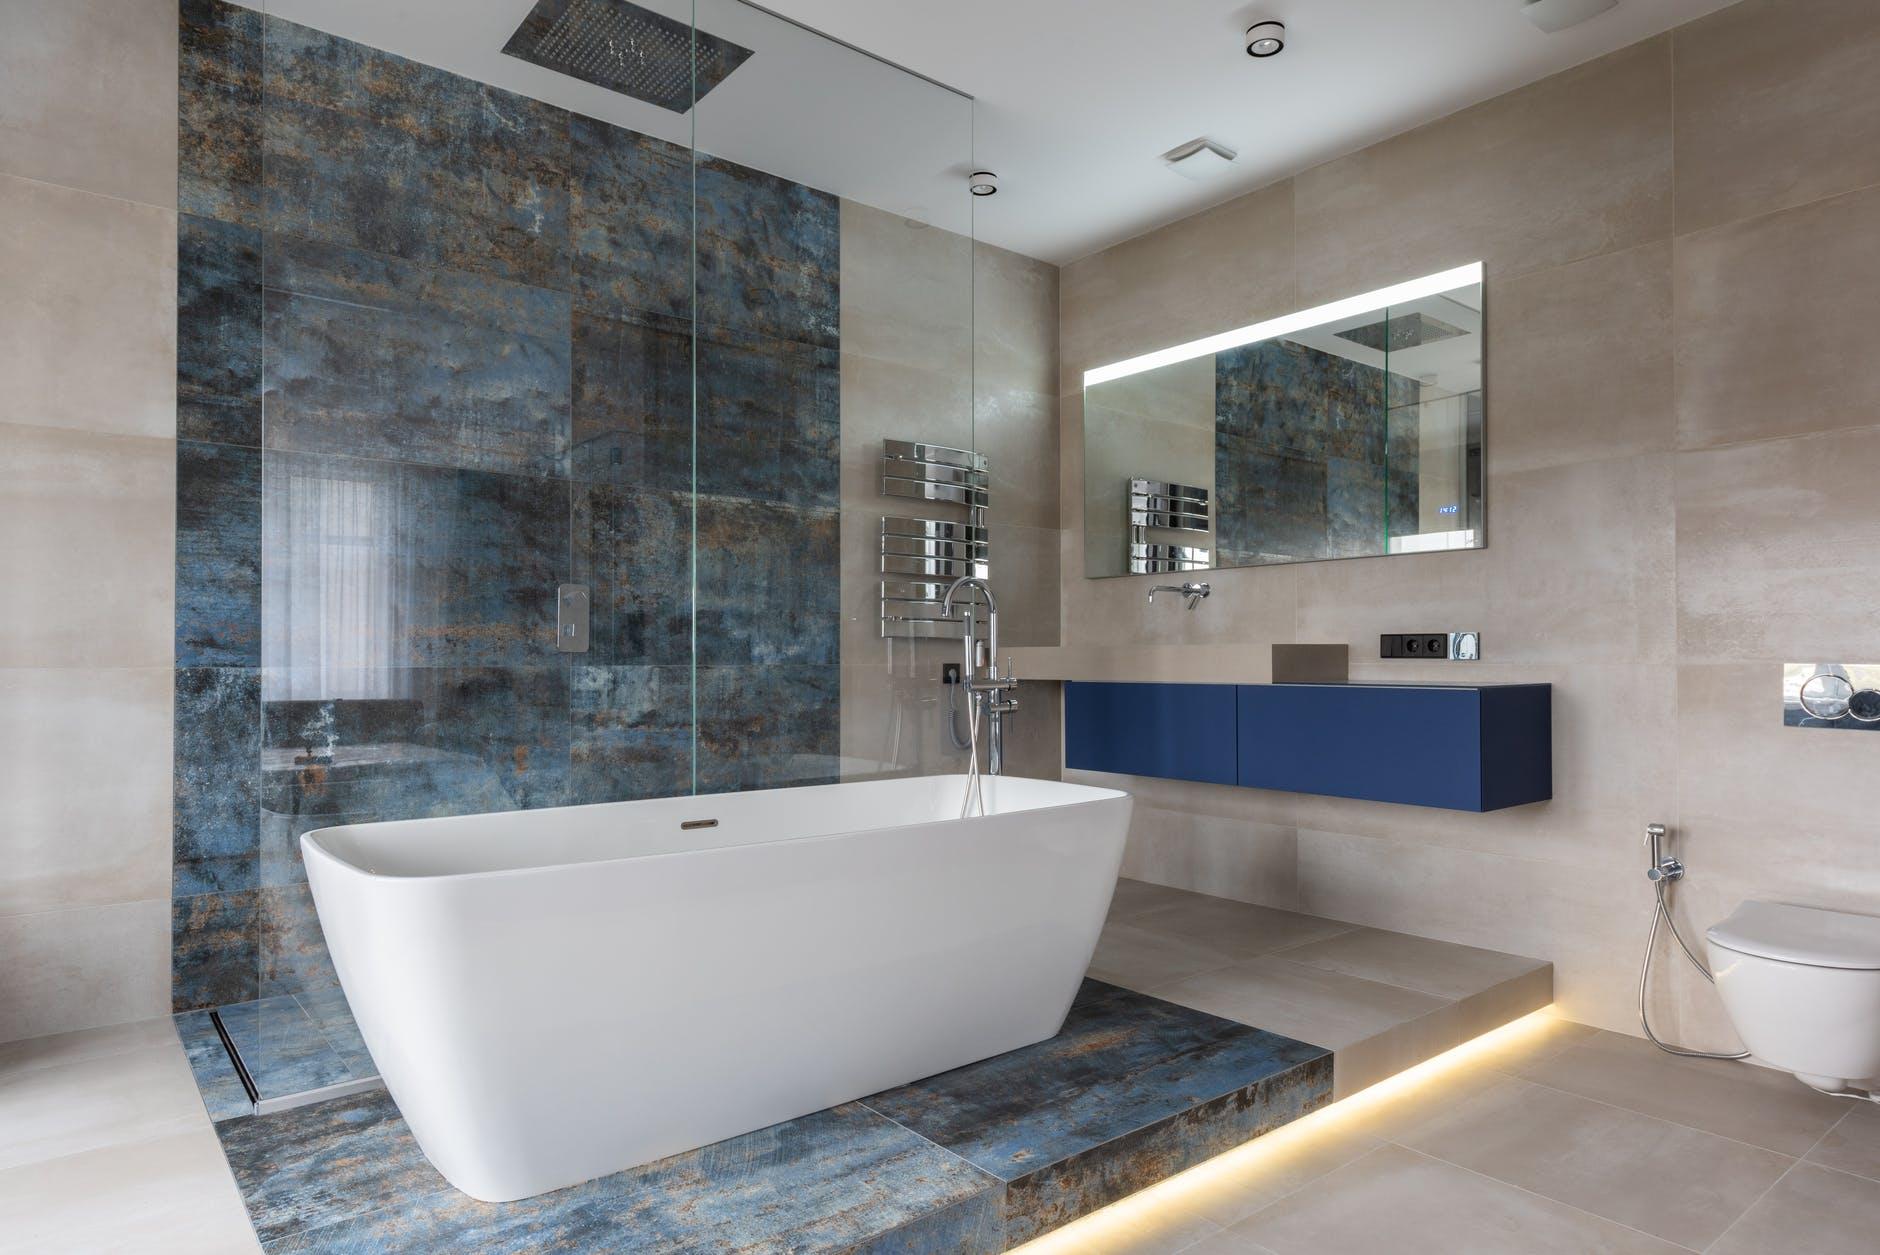 modern bathroom interior with freestanding tub